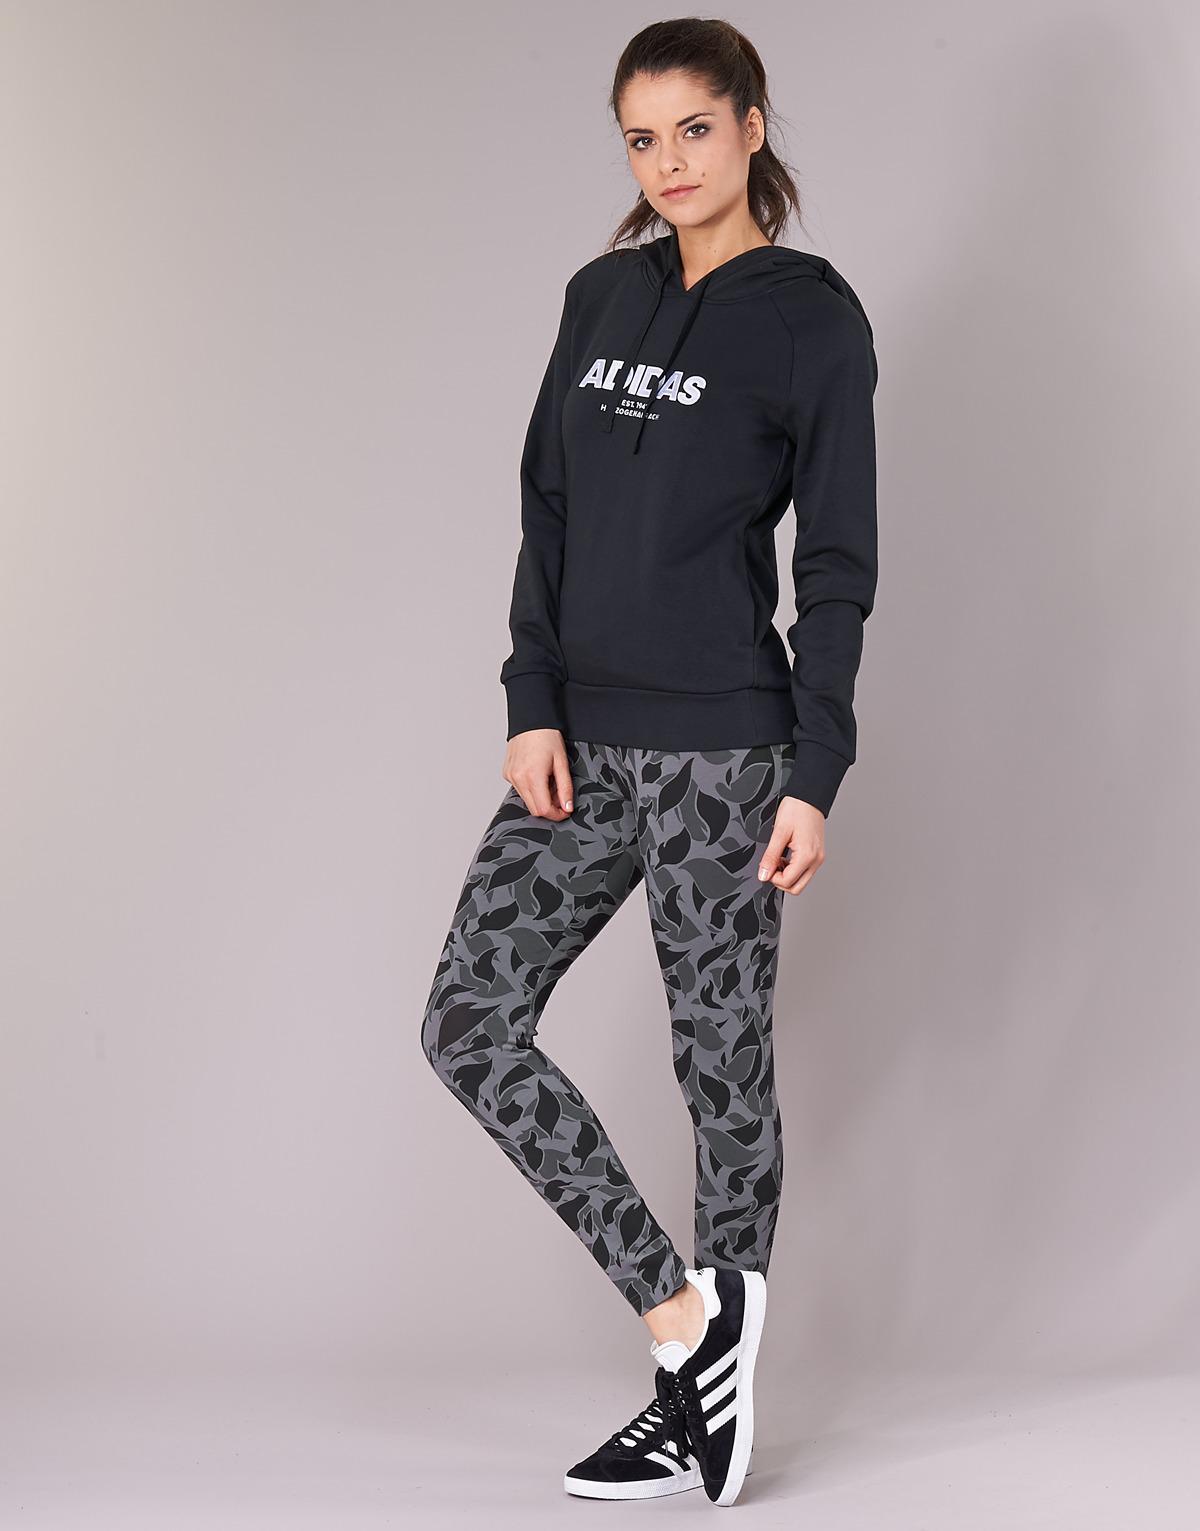 Adidas - Black Ess Allcap Oh H Sweatshirt - Lyst. View fullscreen 4ef06f0cbcd